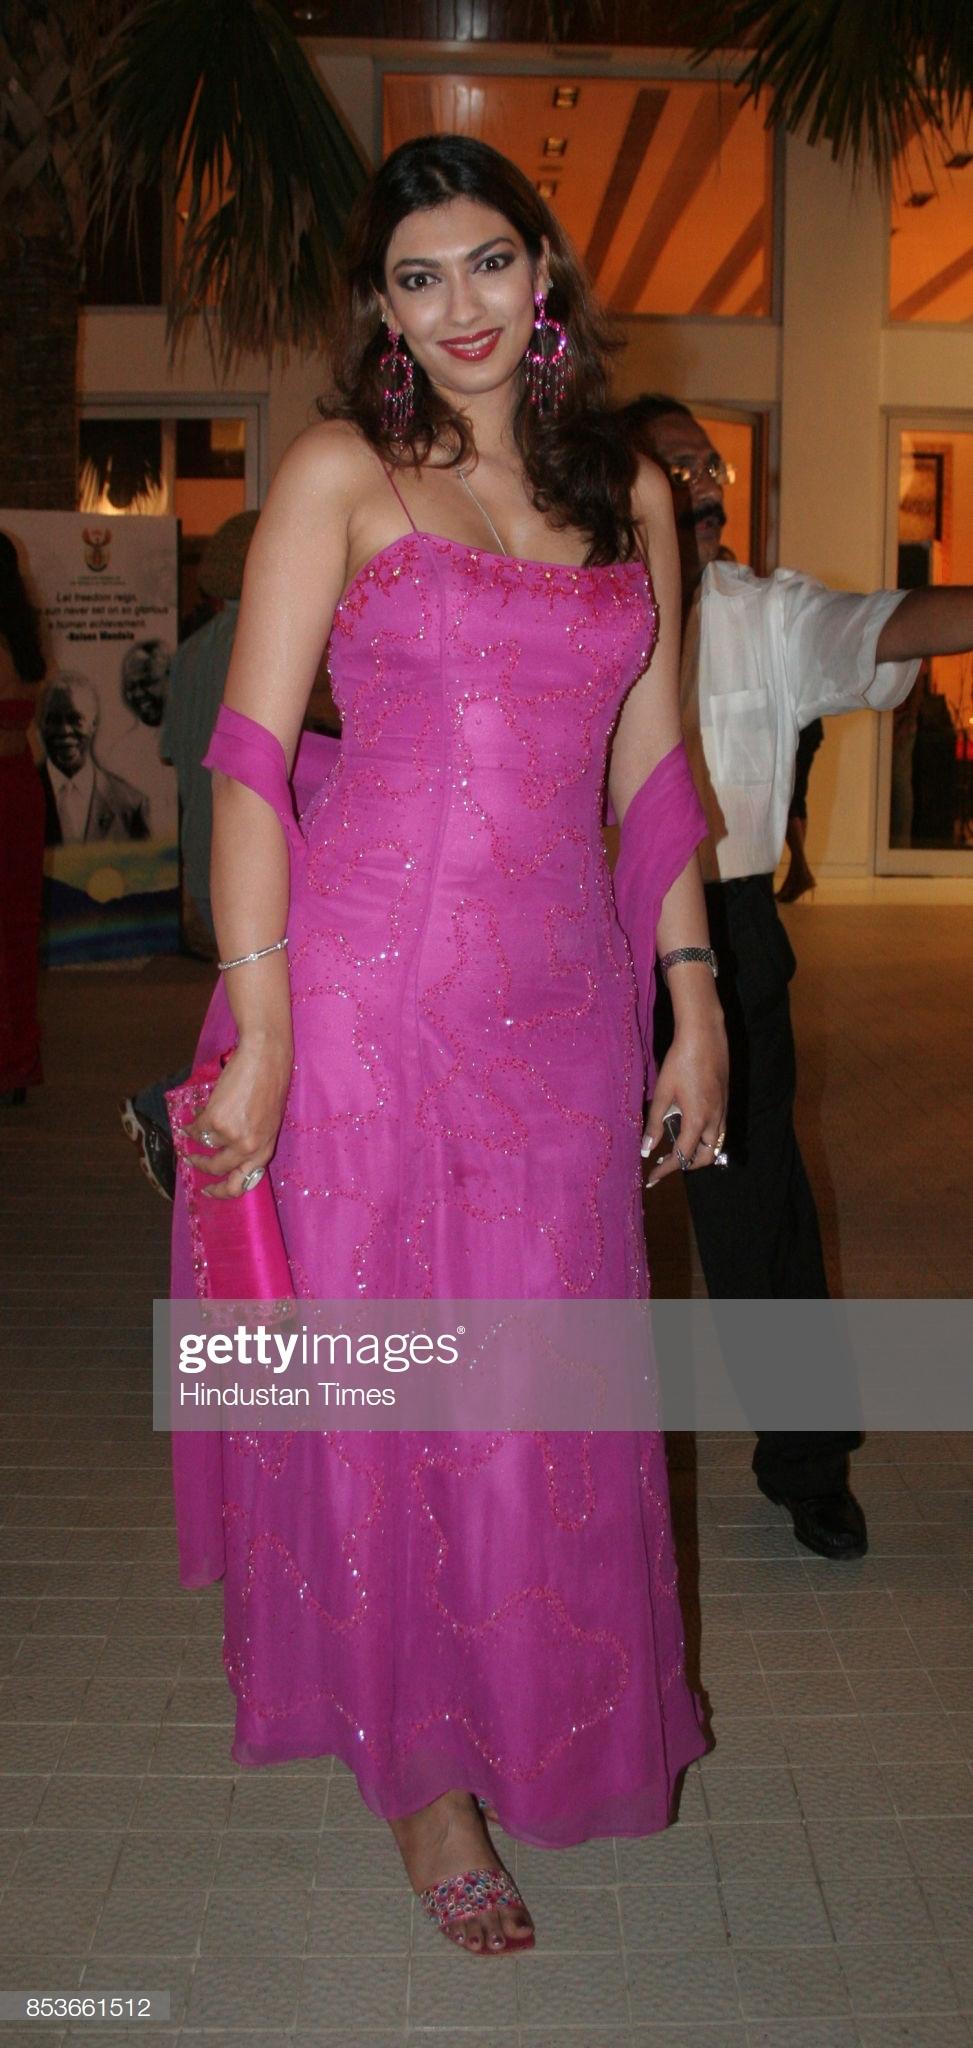 Yukta Mookhey S Feet Wikifeet Yukta mookhey, an indian actress, model and beauty queen. yukta mookhey s feet wikifeet